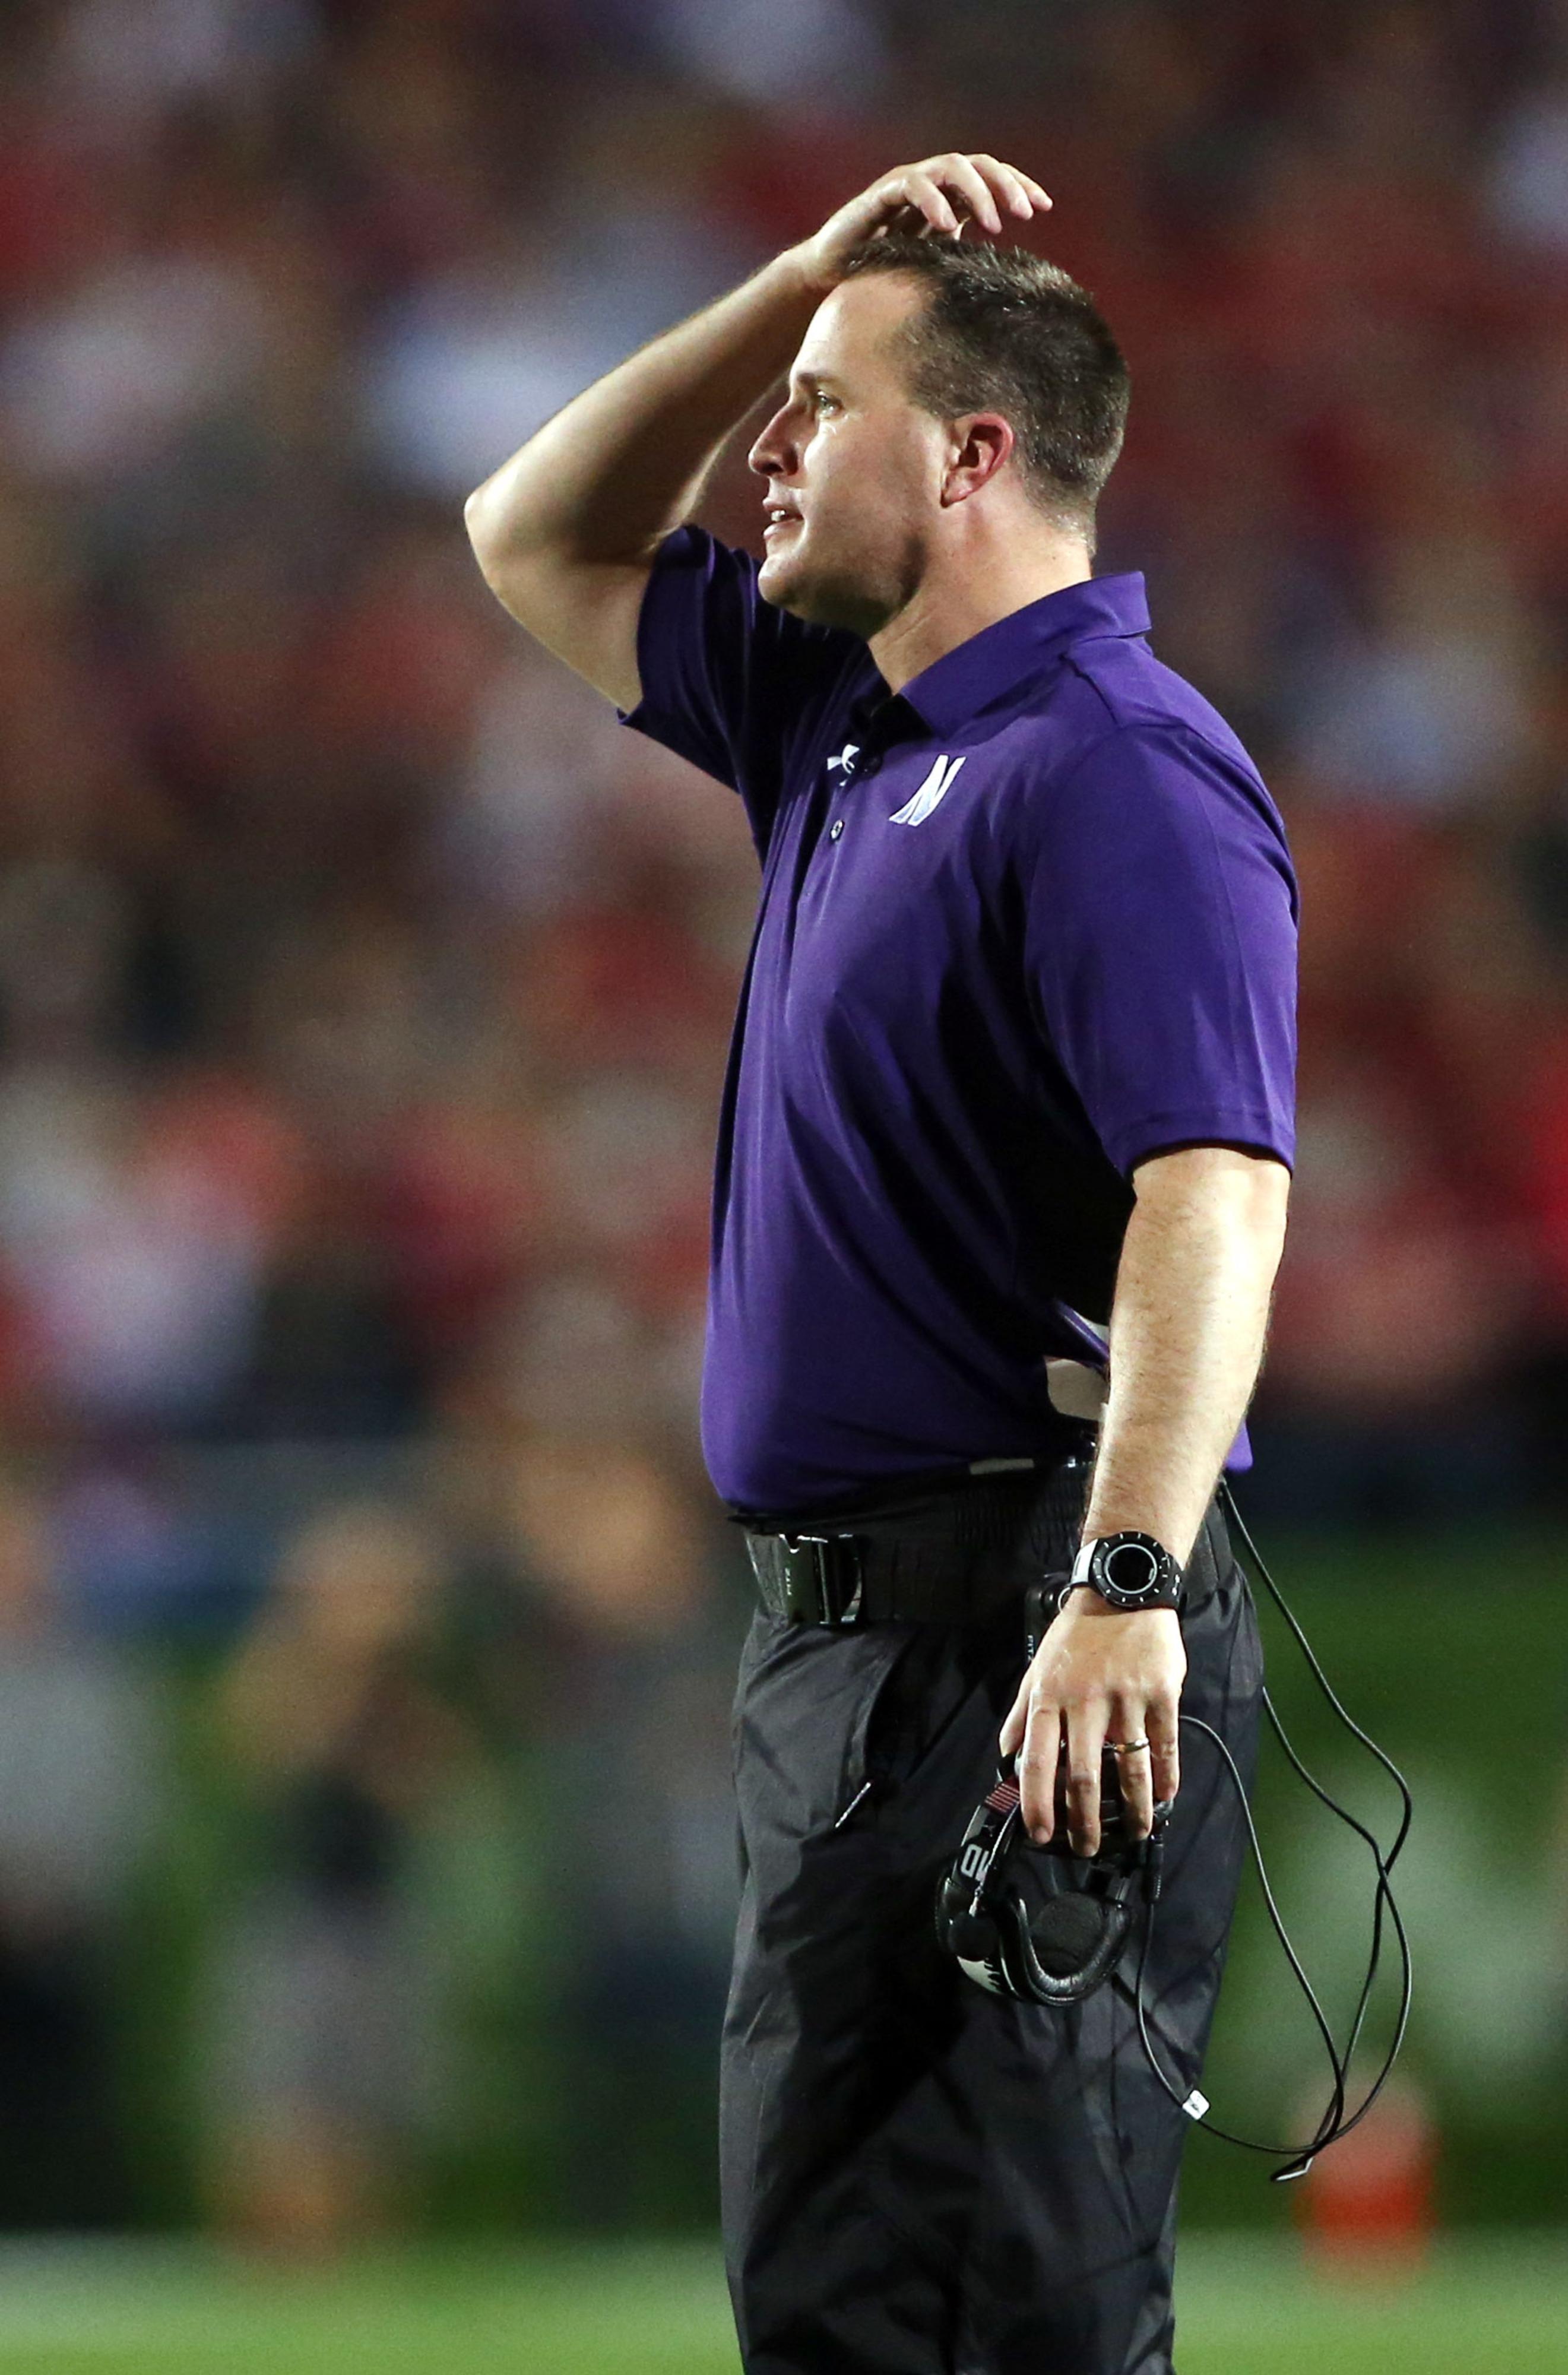 Ohio State's last-second score cost bookies $100 million, expert says